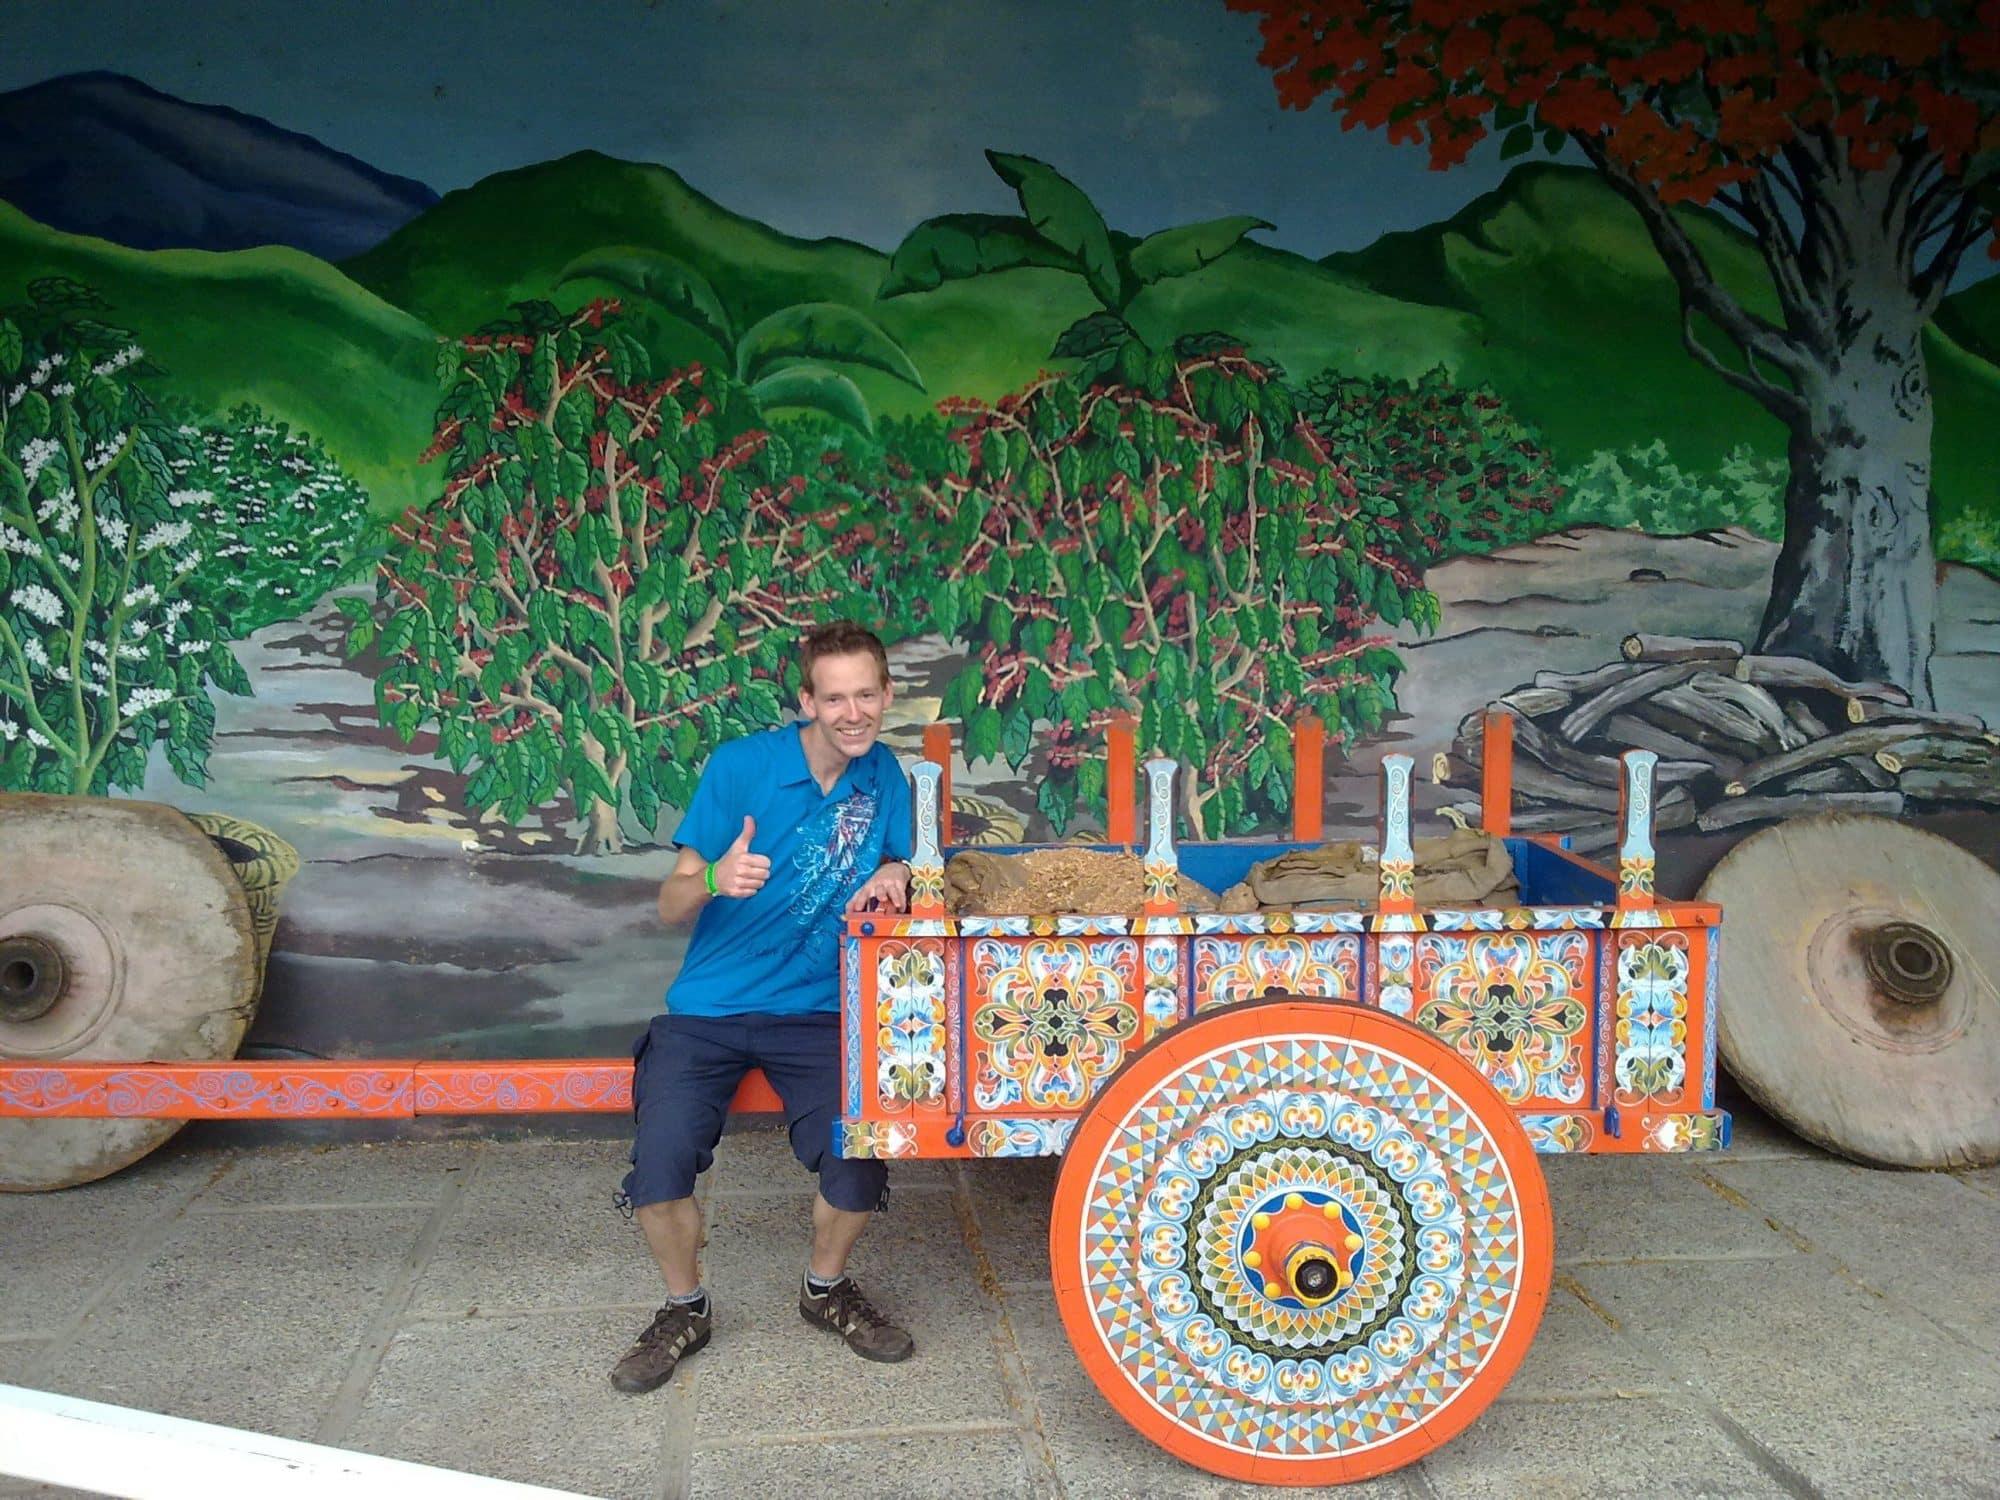 Artisanat à Sarchi - la carreta, traditionnelle charrette colorée du Costa Rica